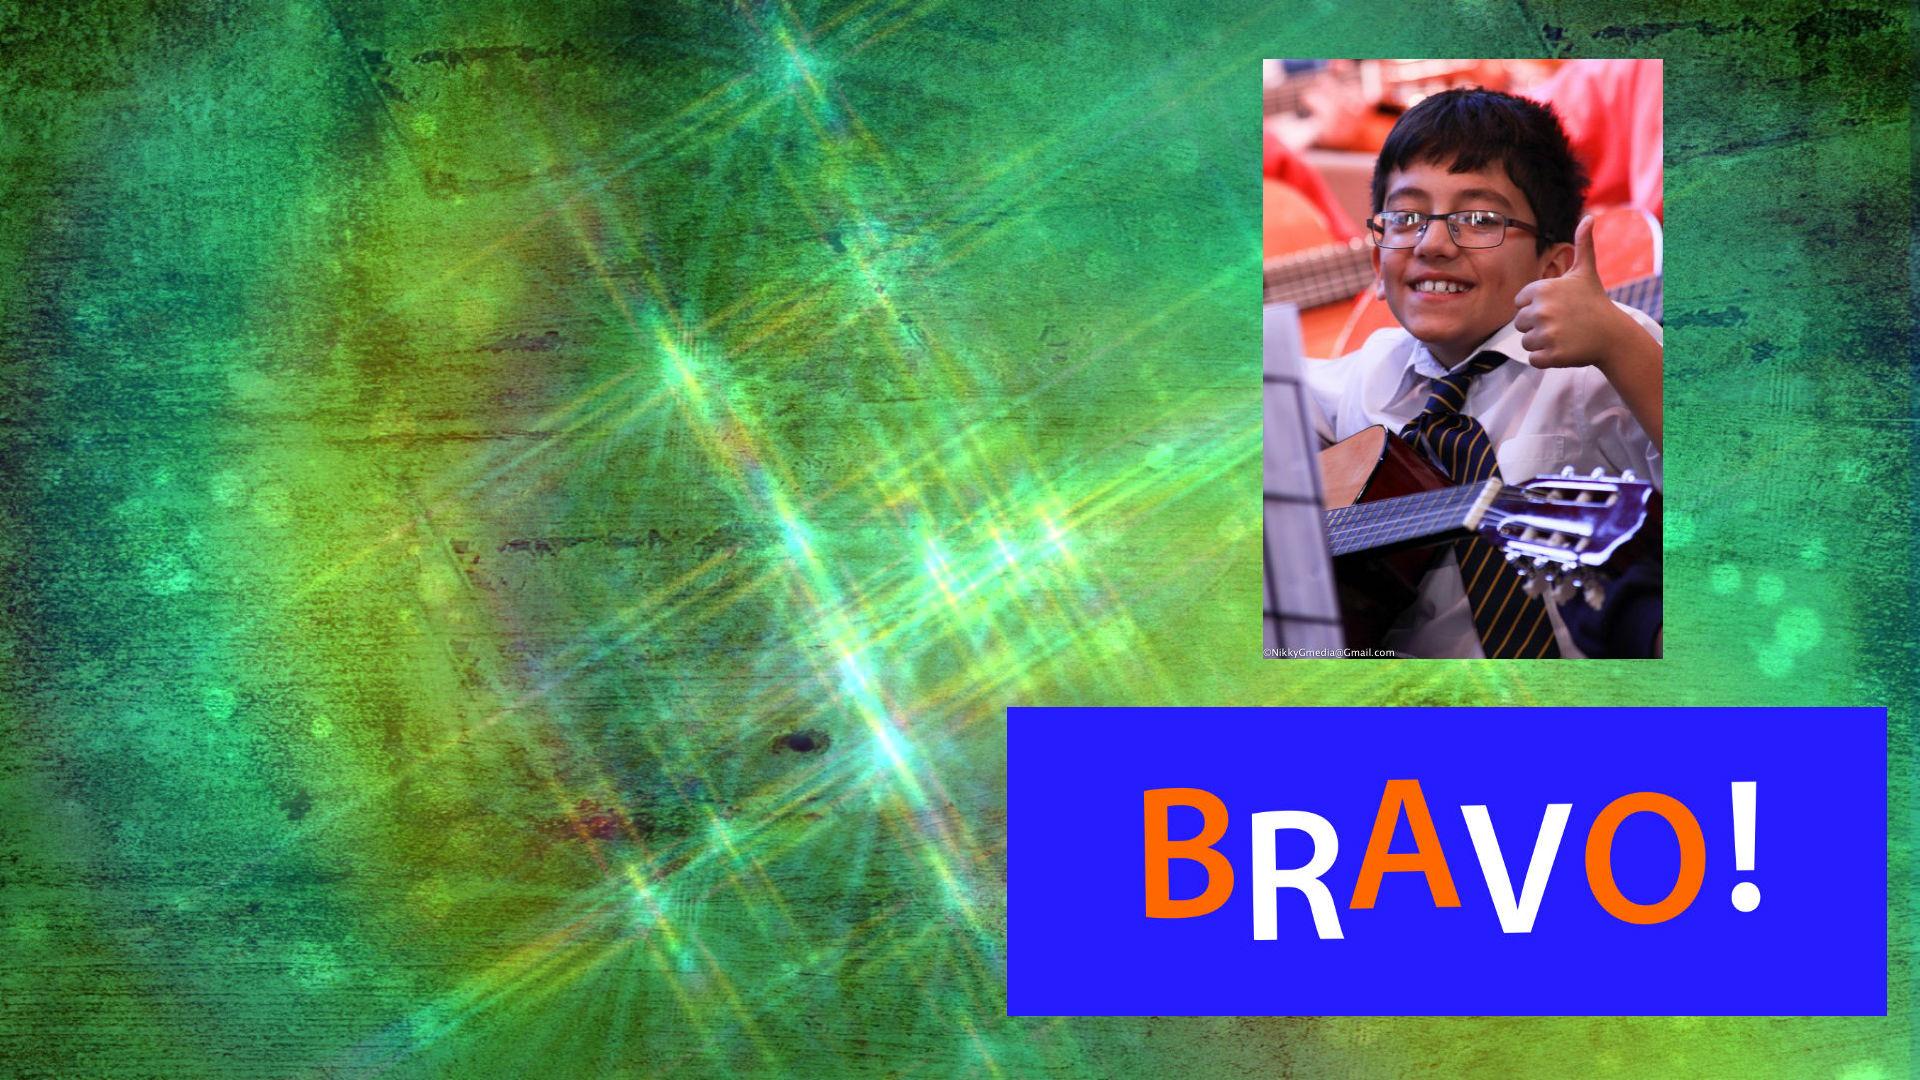 Bravo slider December 2015